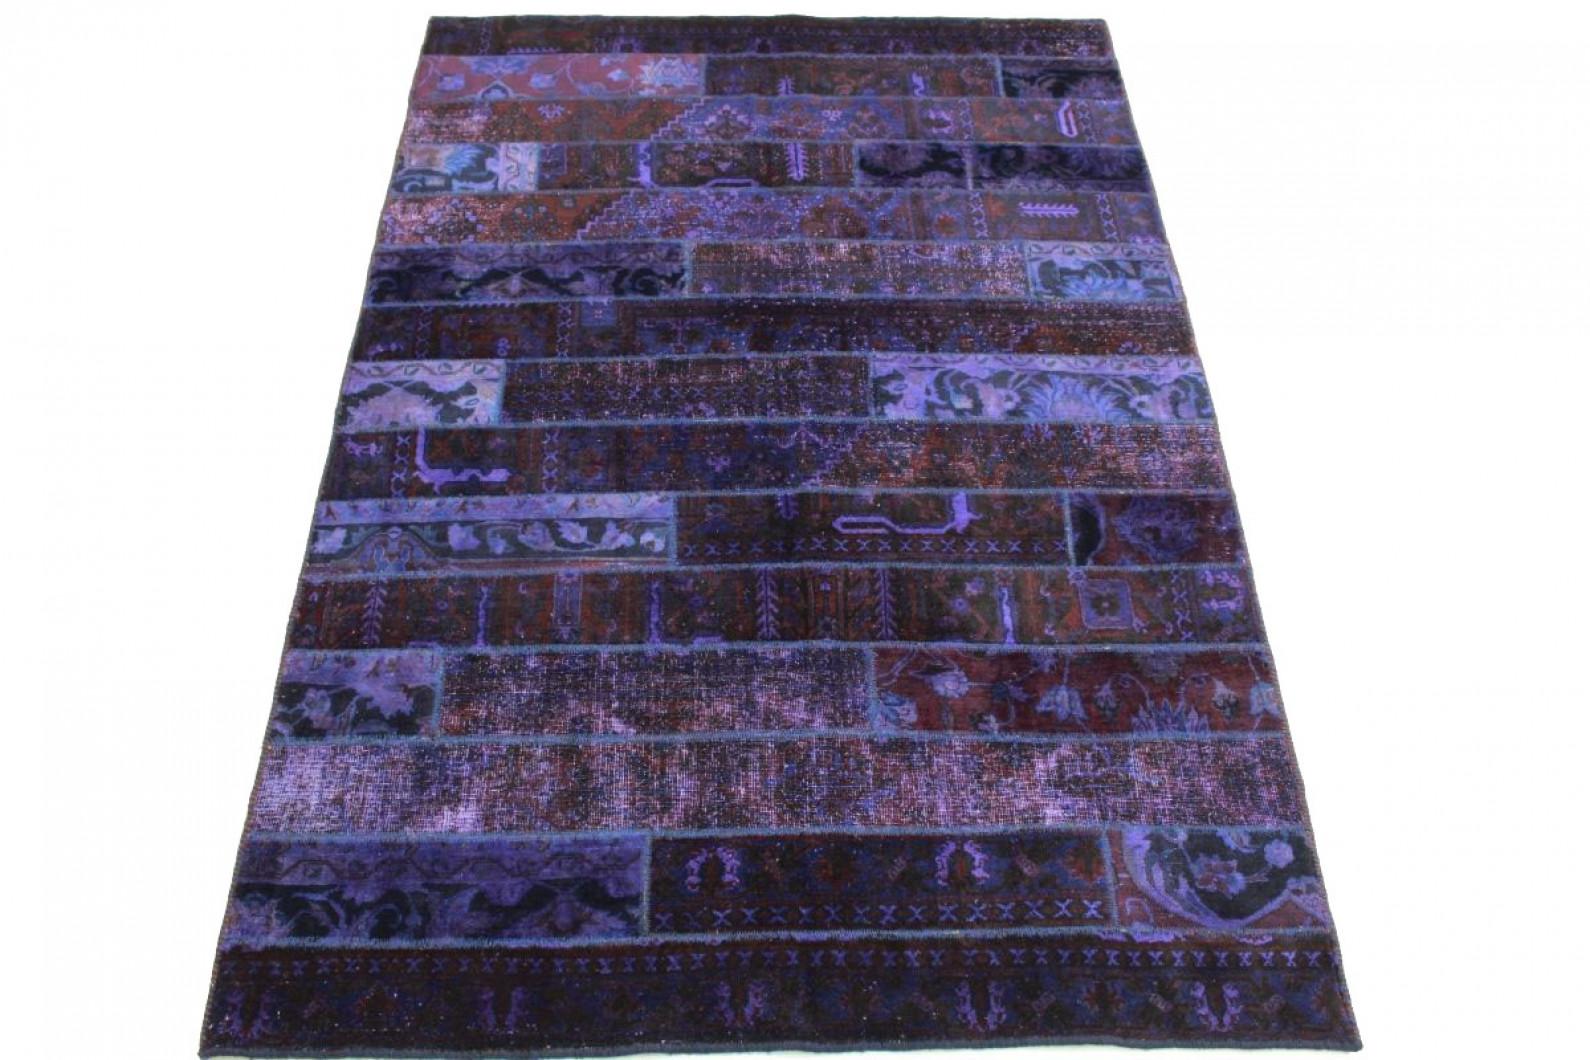 patchwork teppich lila in 250x170cm 1001 1615 bei. Black Bedroom Furniture Sets. Home Design Ideas